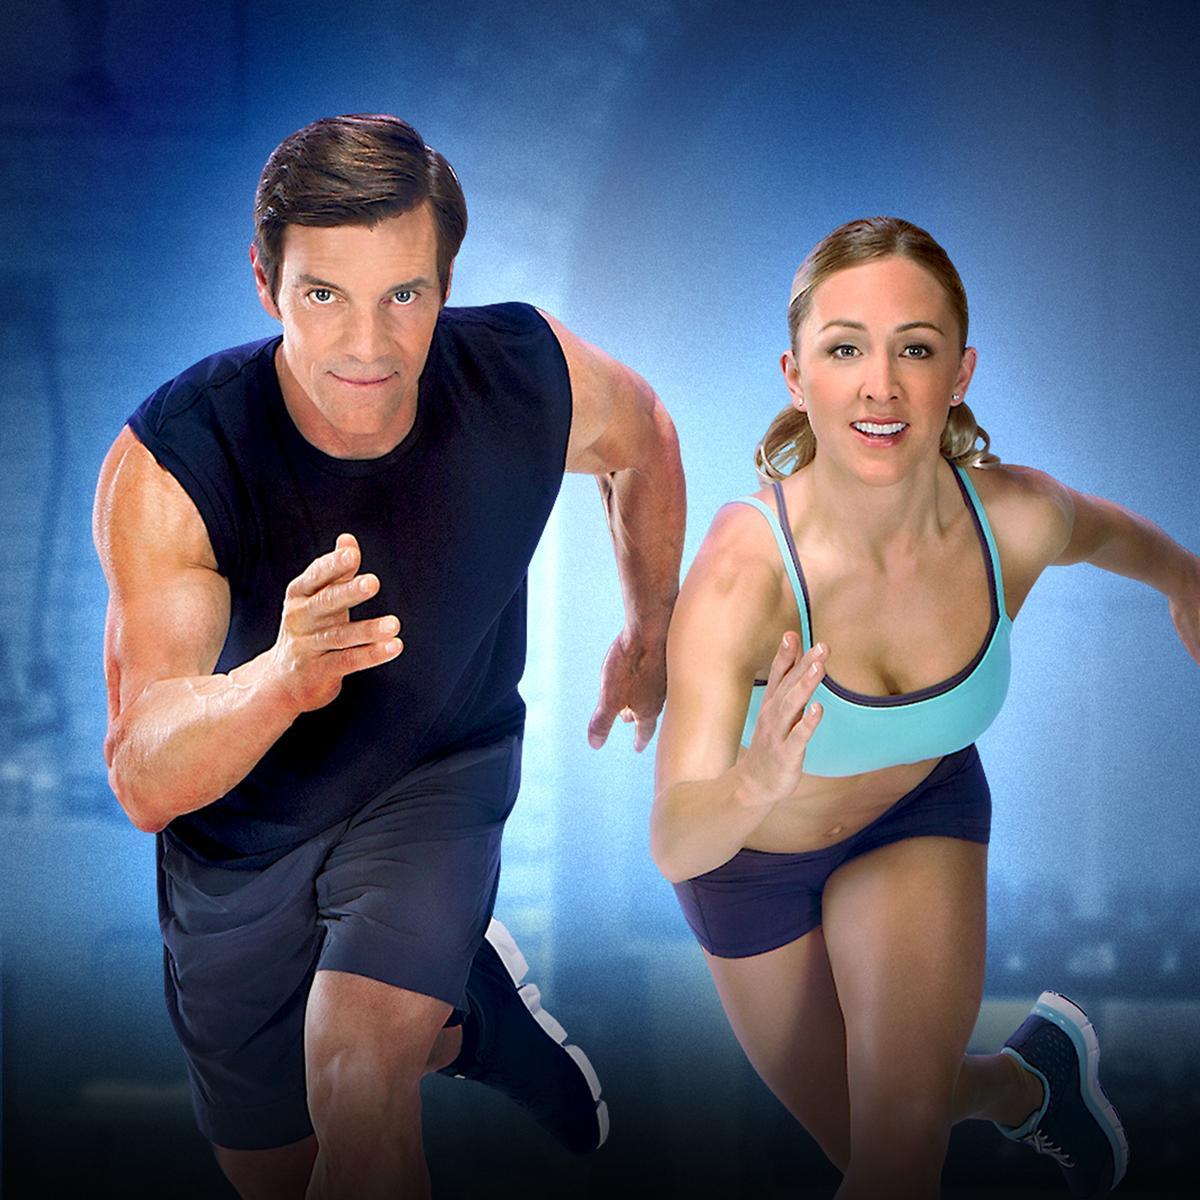 Beachbody currently has around 2.8 million total digital fitness subscribers / Beachbody